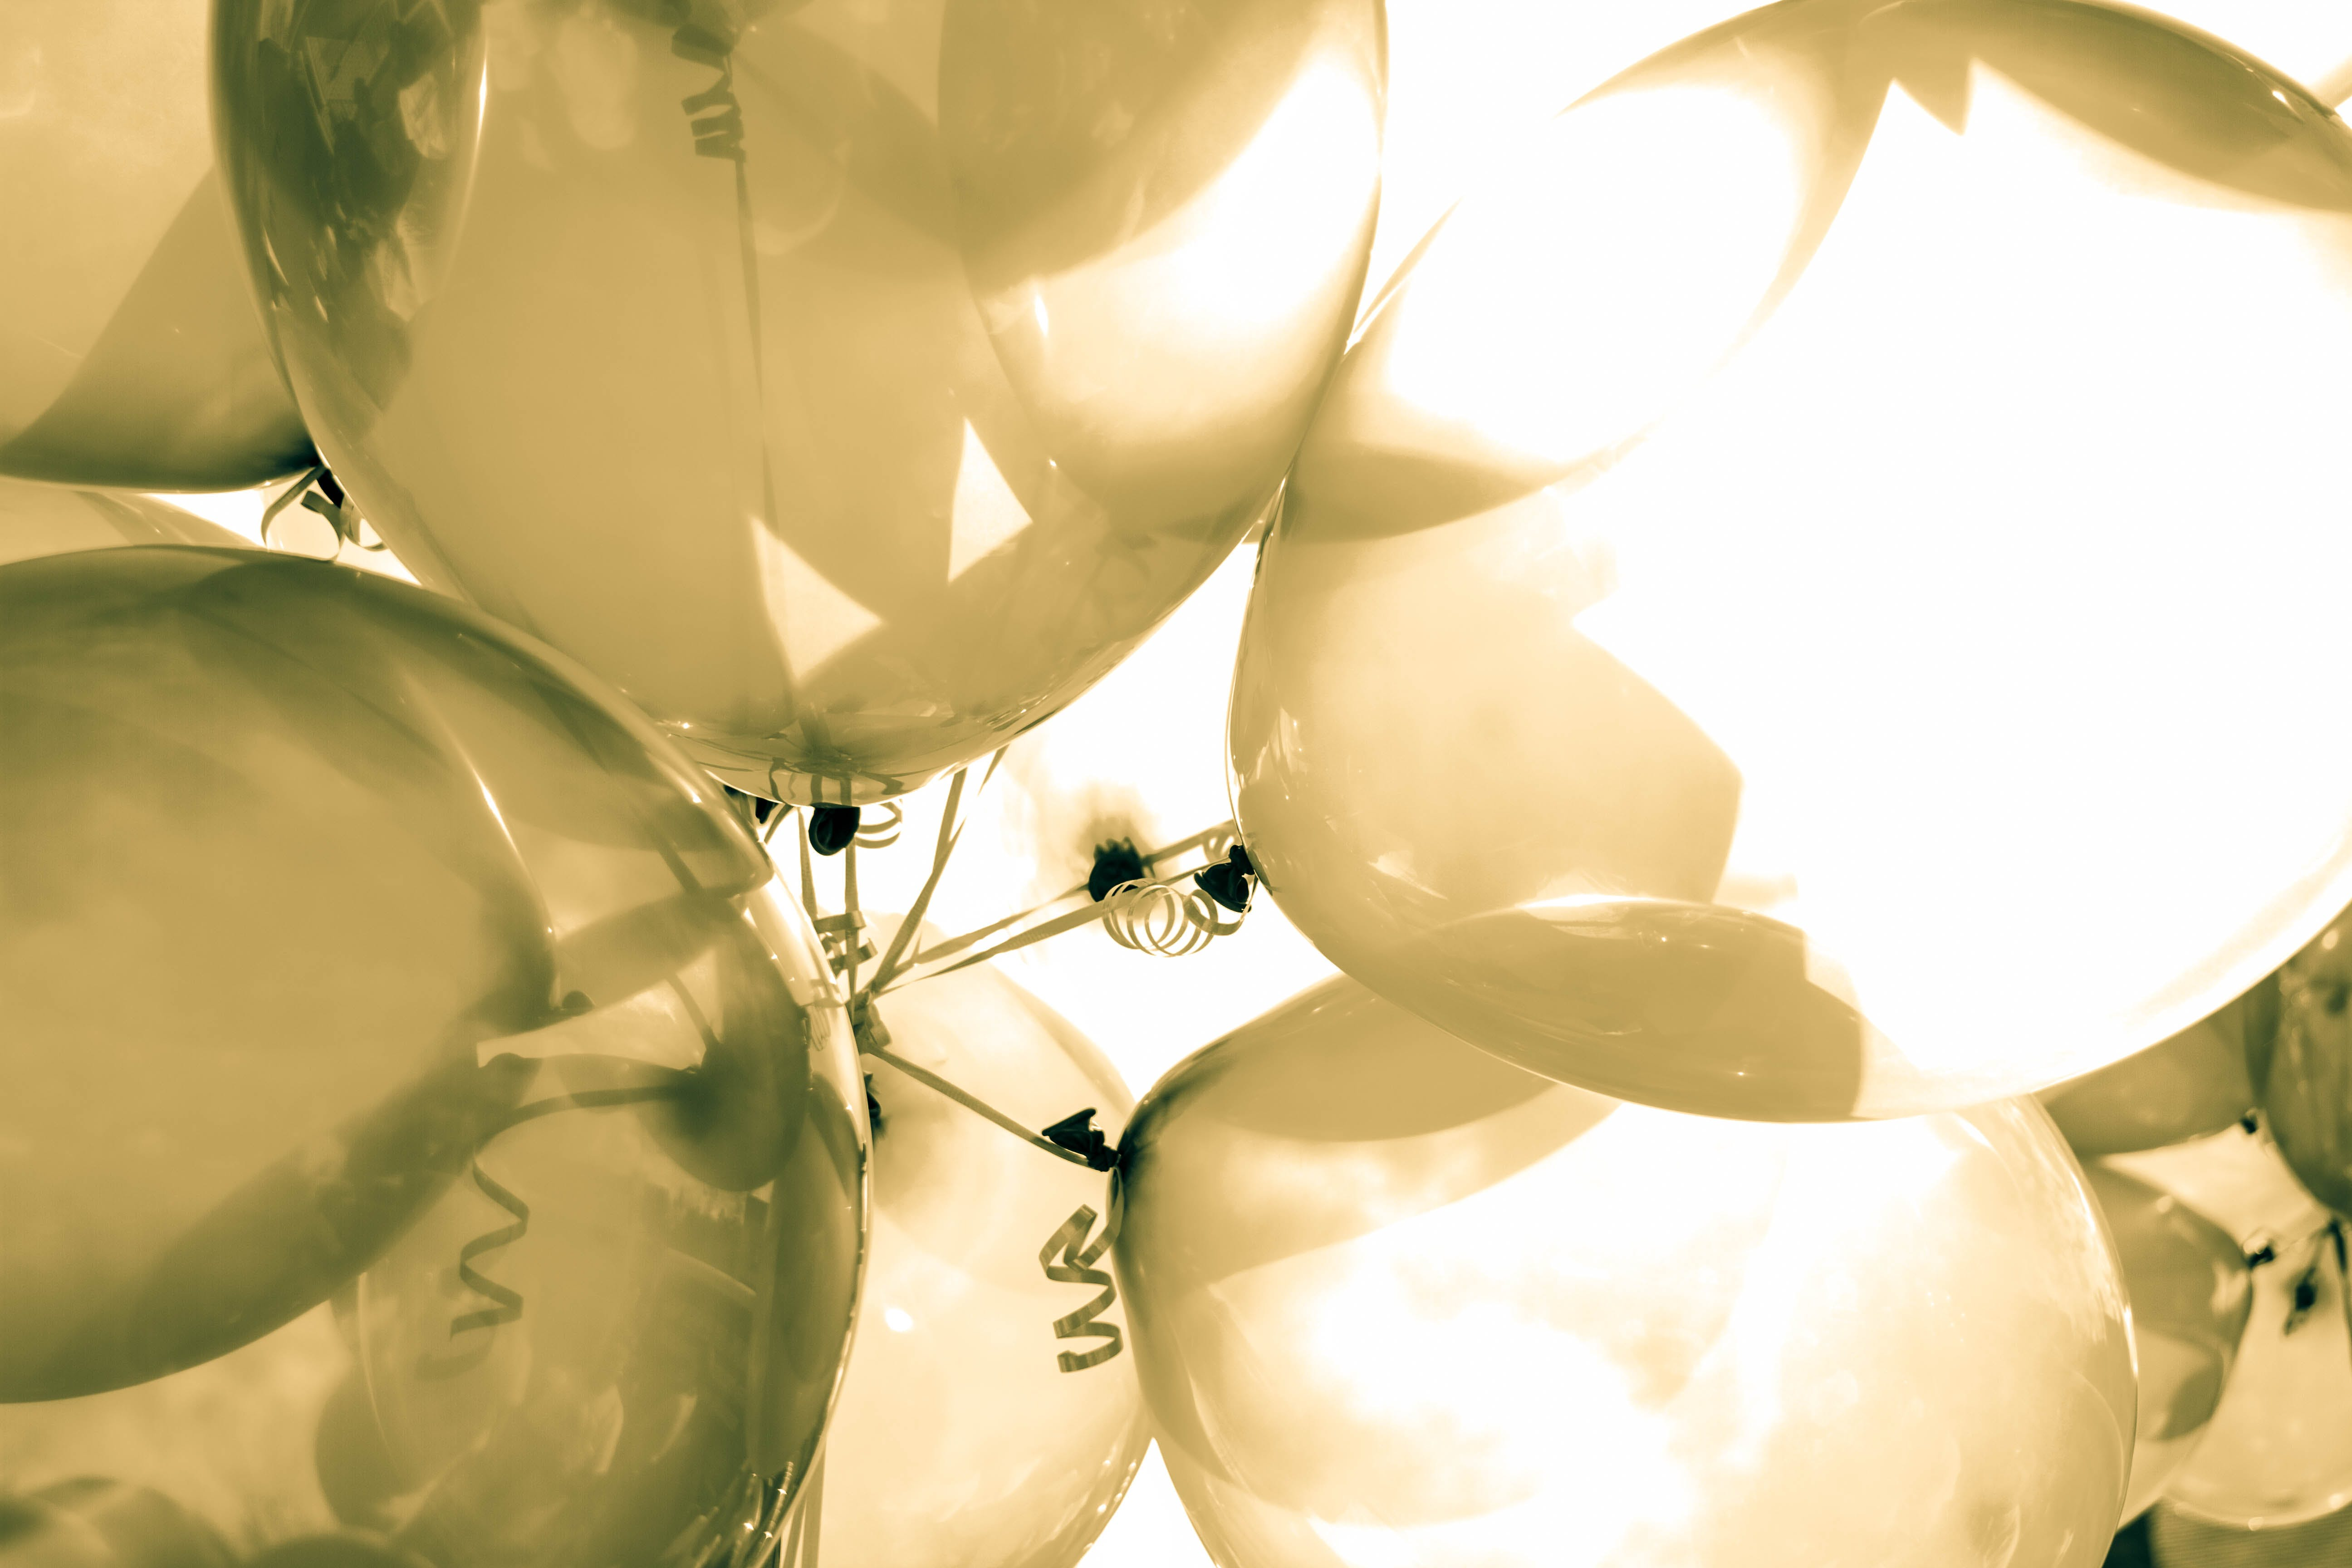 Kostenloses Stock Foto zu ballons, grün, nahansicht